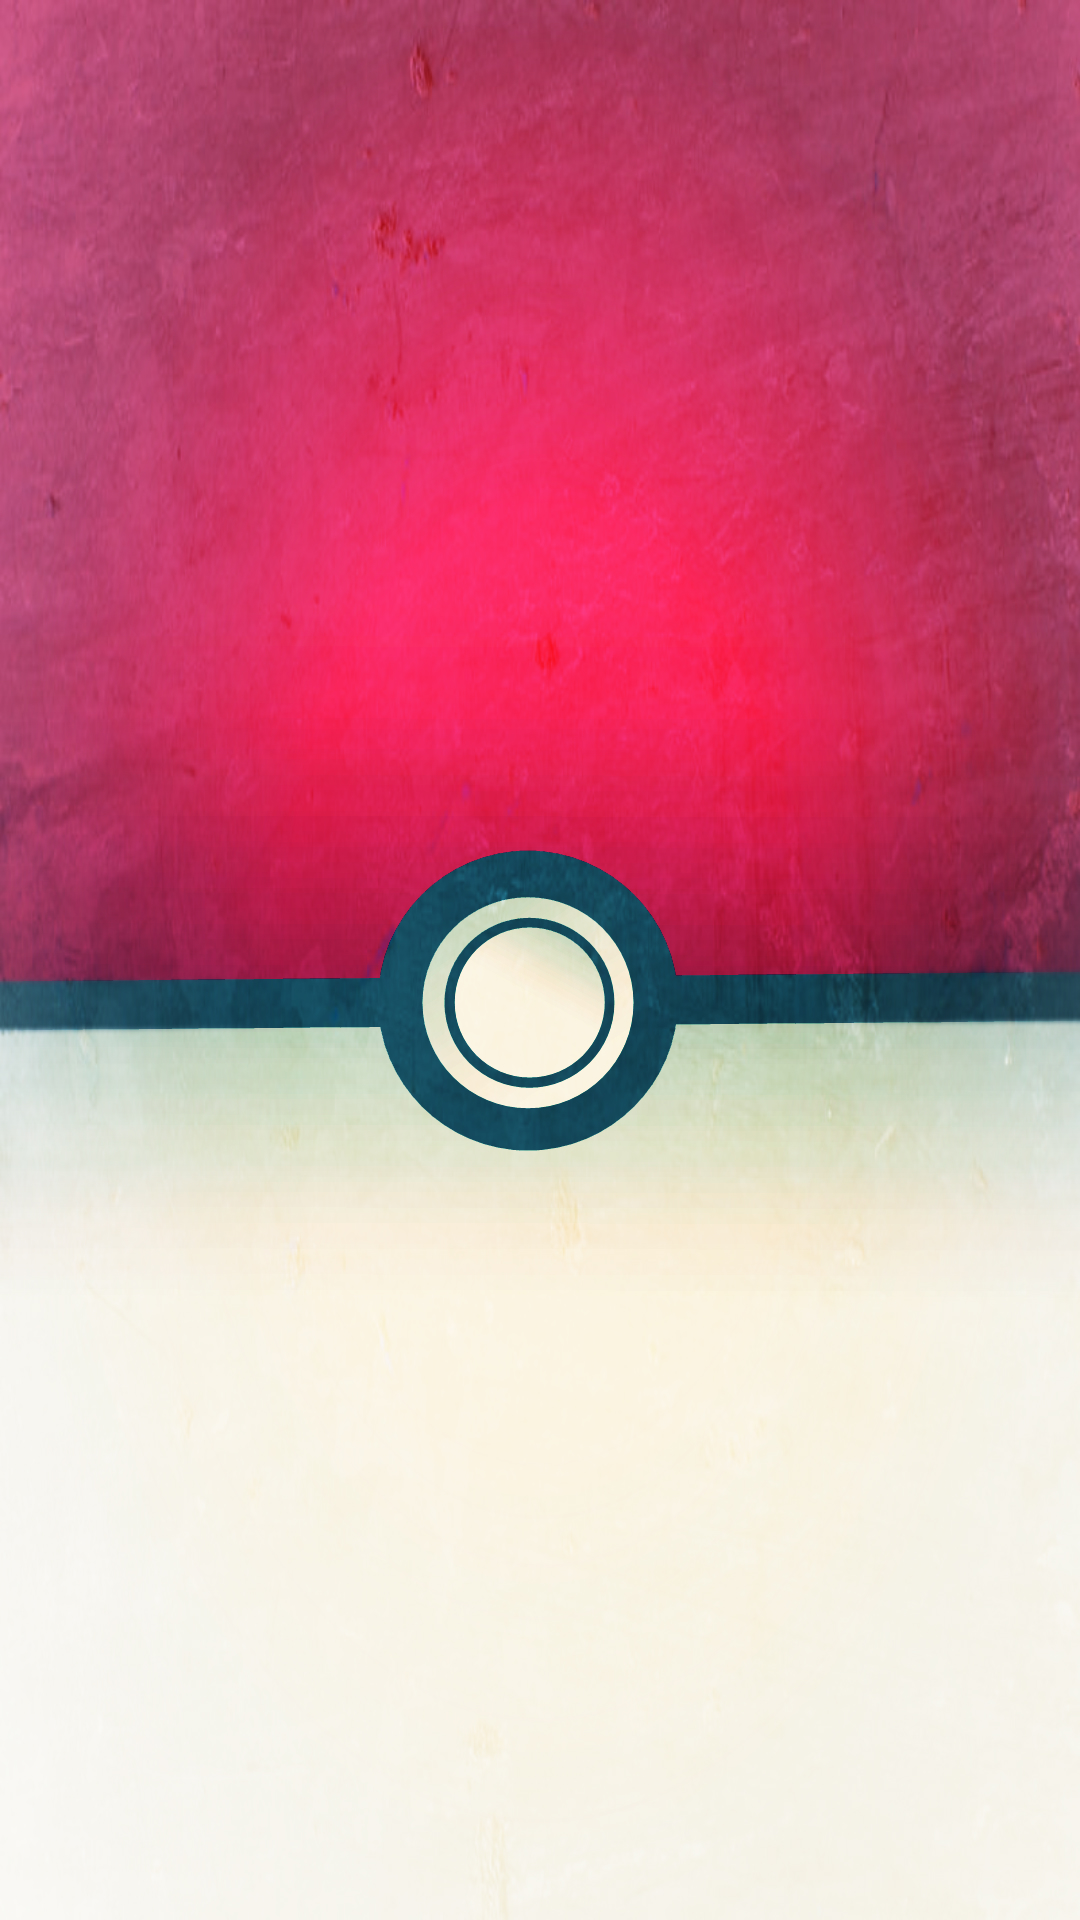 Pokemon Phone Wallpaper 4k 1080x1920 Download Hd Wallpaper Wallpapertip